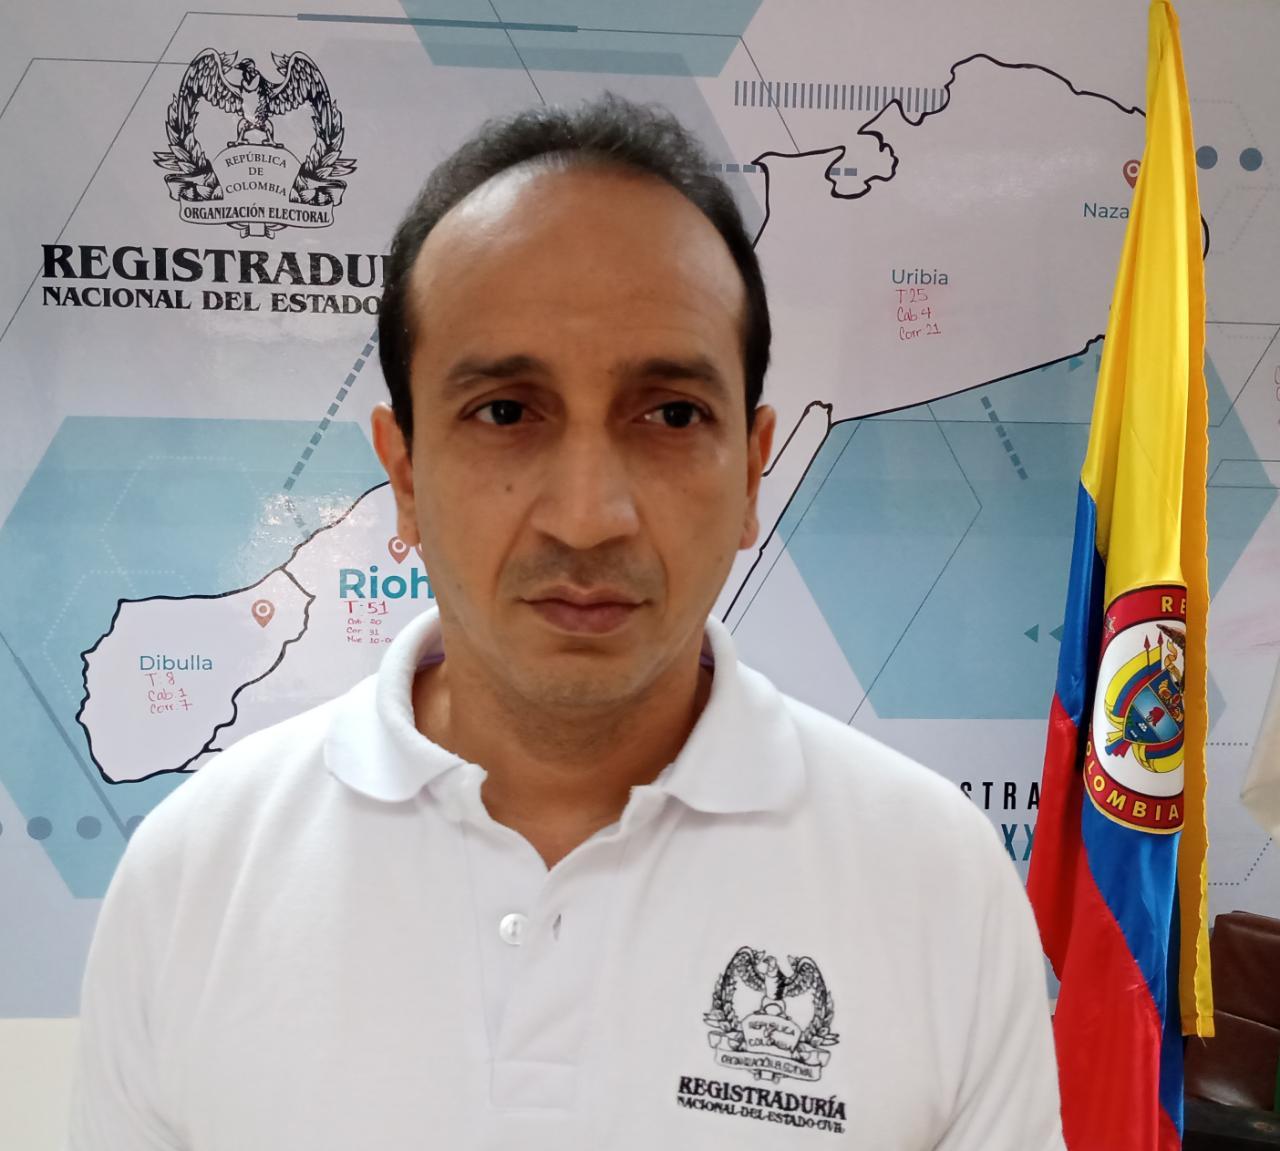 https://www.notasrosas.com/La Guajira, preparada para expedir nueva Cédula Digital